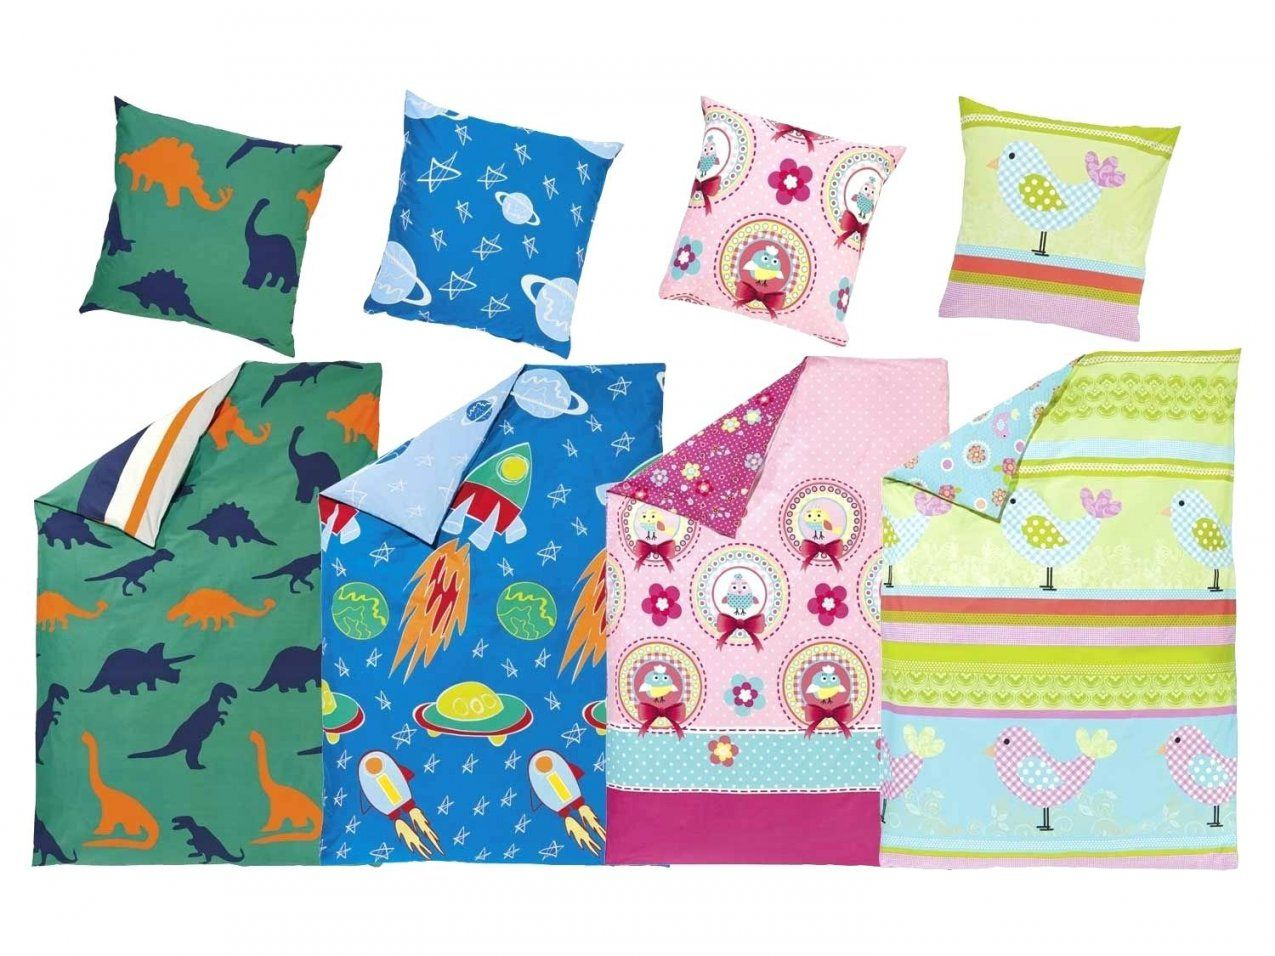 Bettwasche Kinder Meradisoar Kinder Renforcac Bettwasche 135 X 200 von Biber Bettwäsche Kinderbett Bild